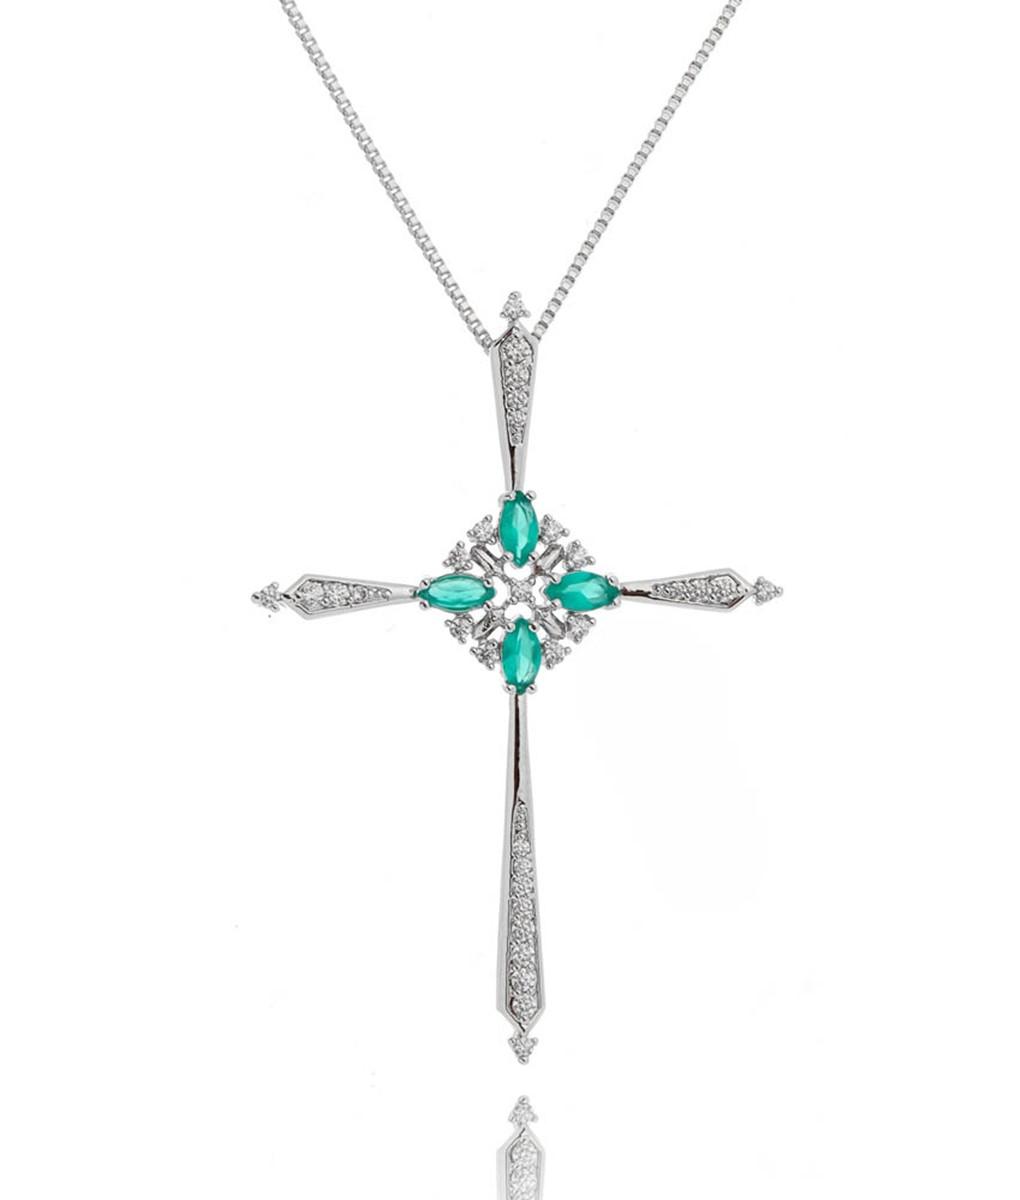 crucifixo da moda com zirconias verdes semi joia religiosa